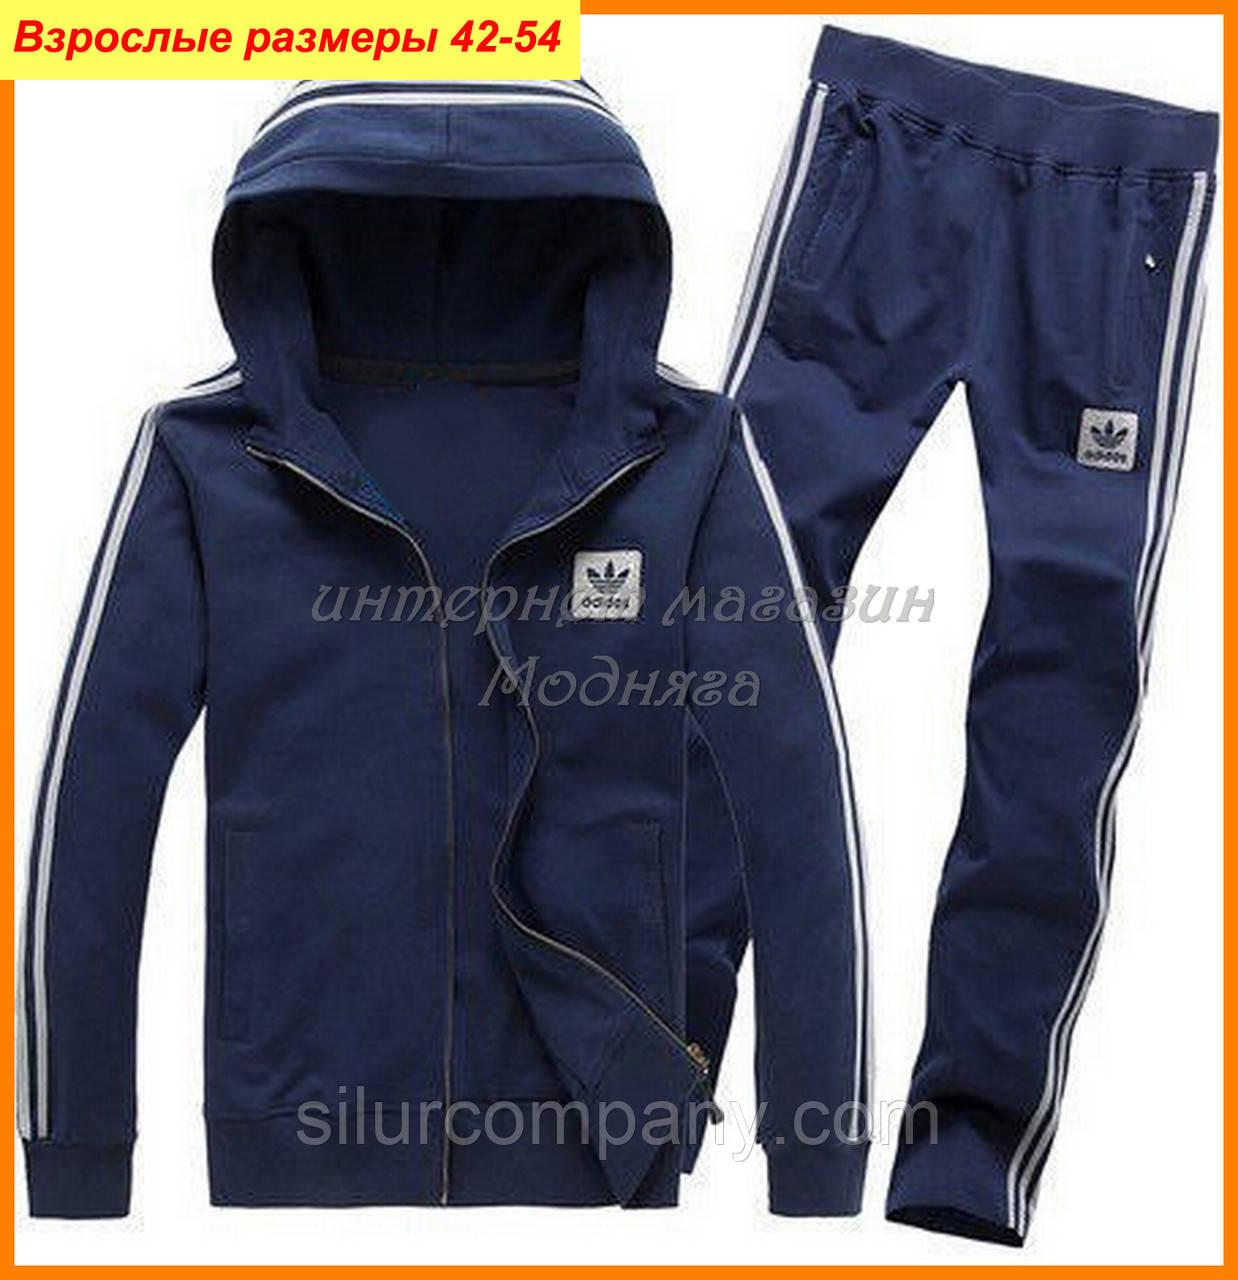 181940a02b0 Темно-синий костюм Adidas с квадратным лого  продажа